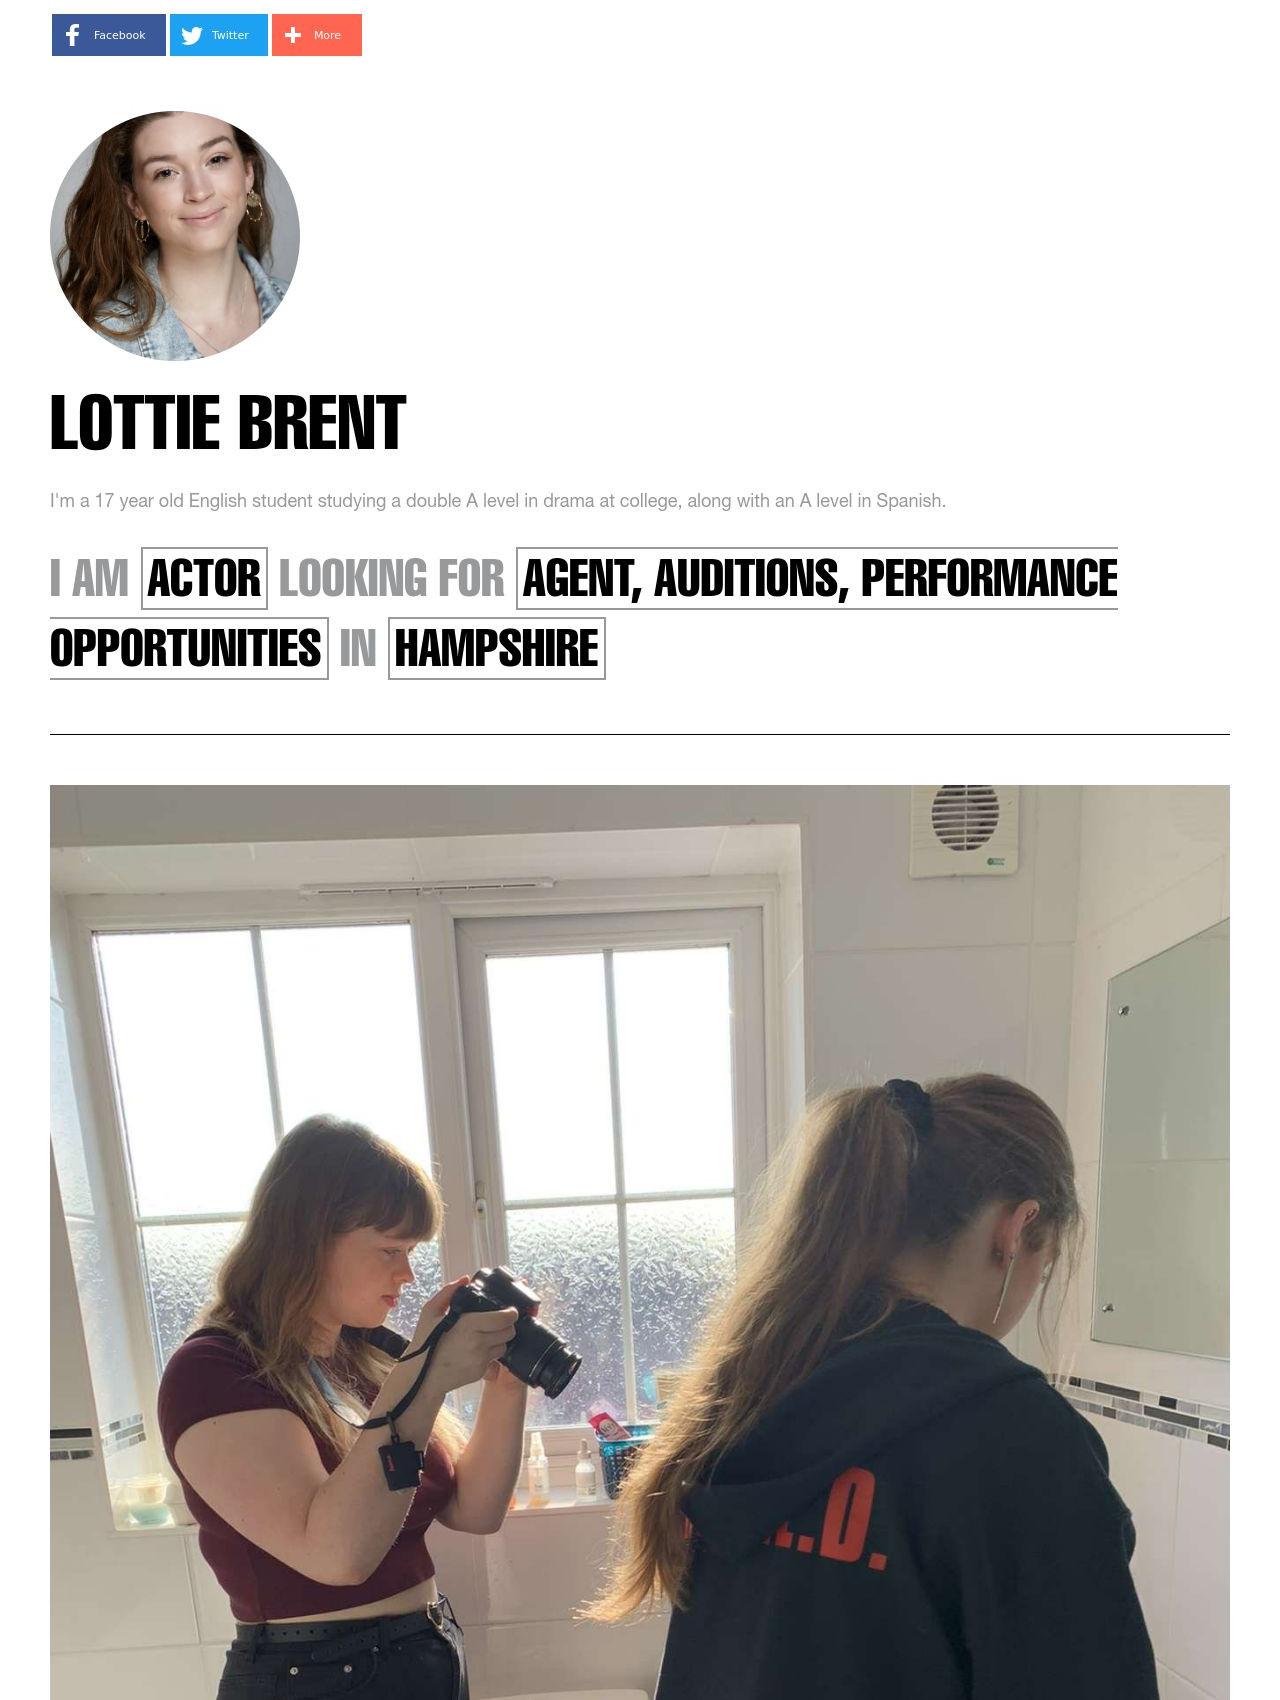 Lottie Brent